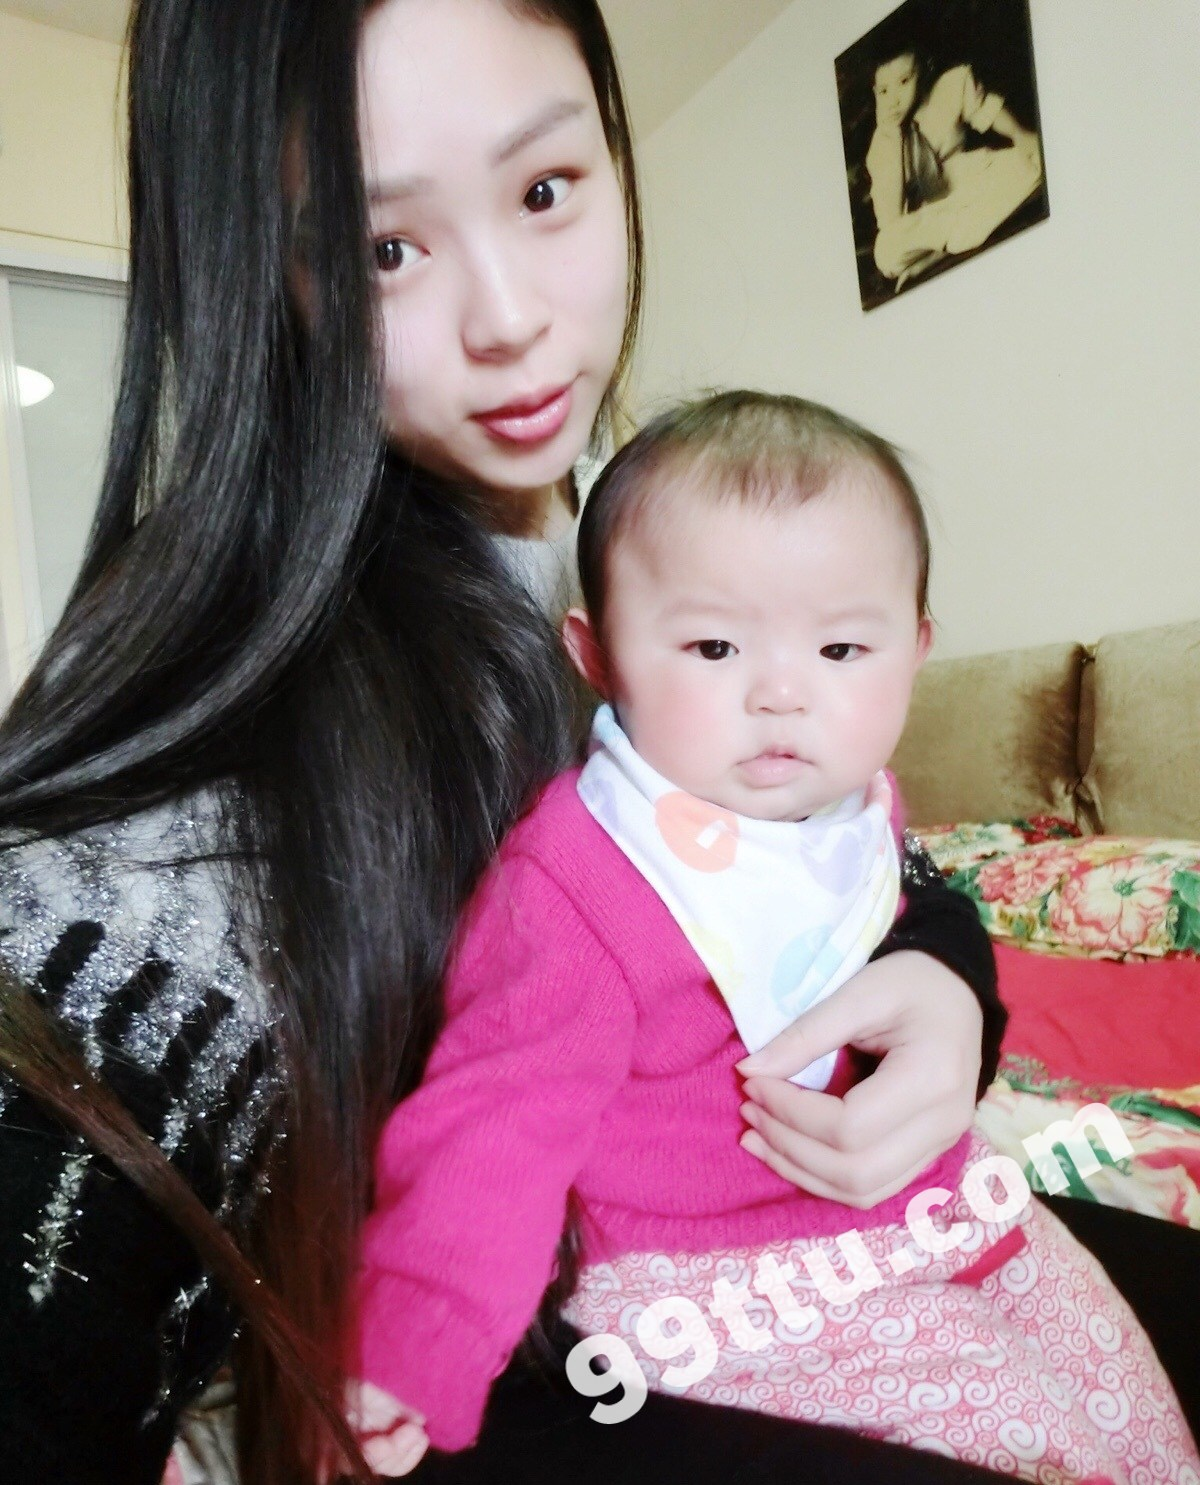 KK54_332张 有孕妇照超真实青春美女生活照-3